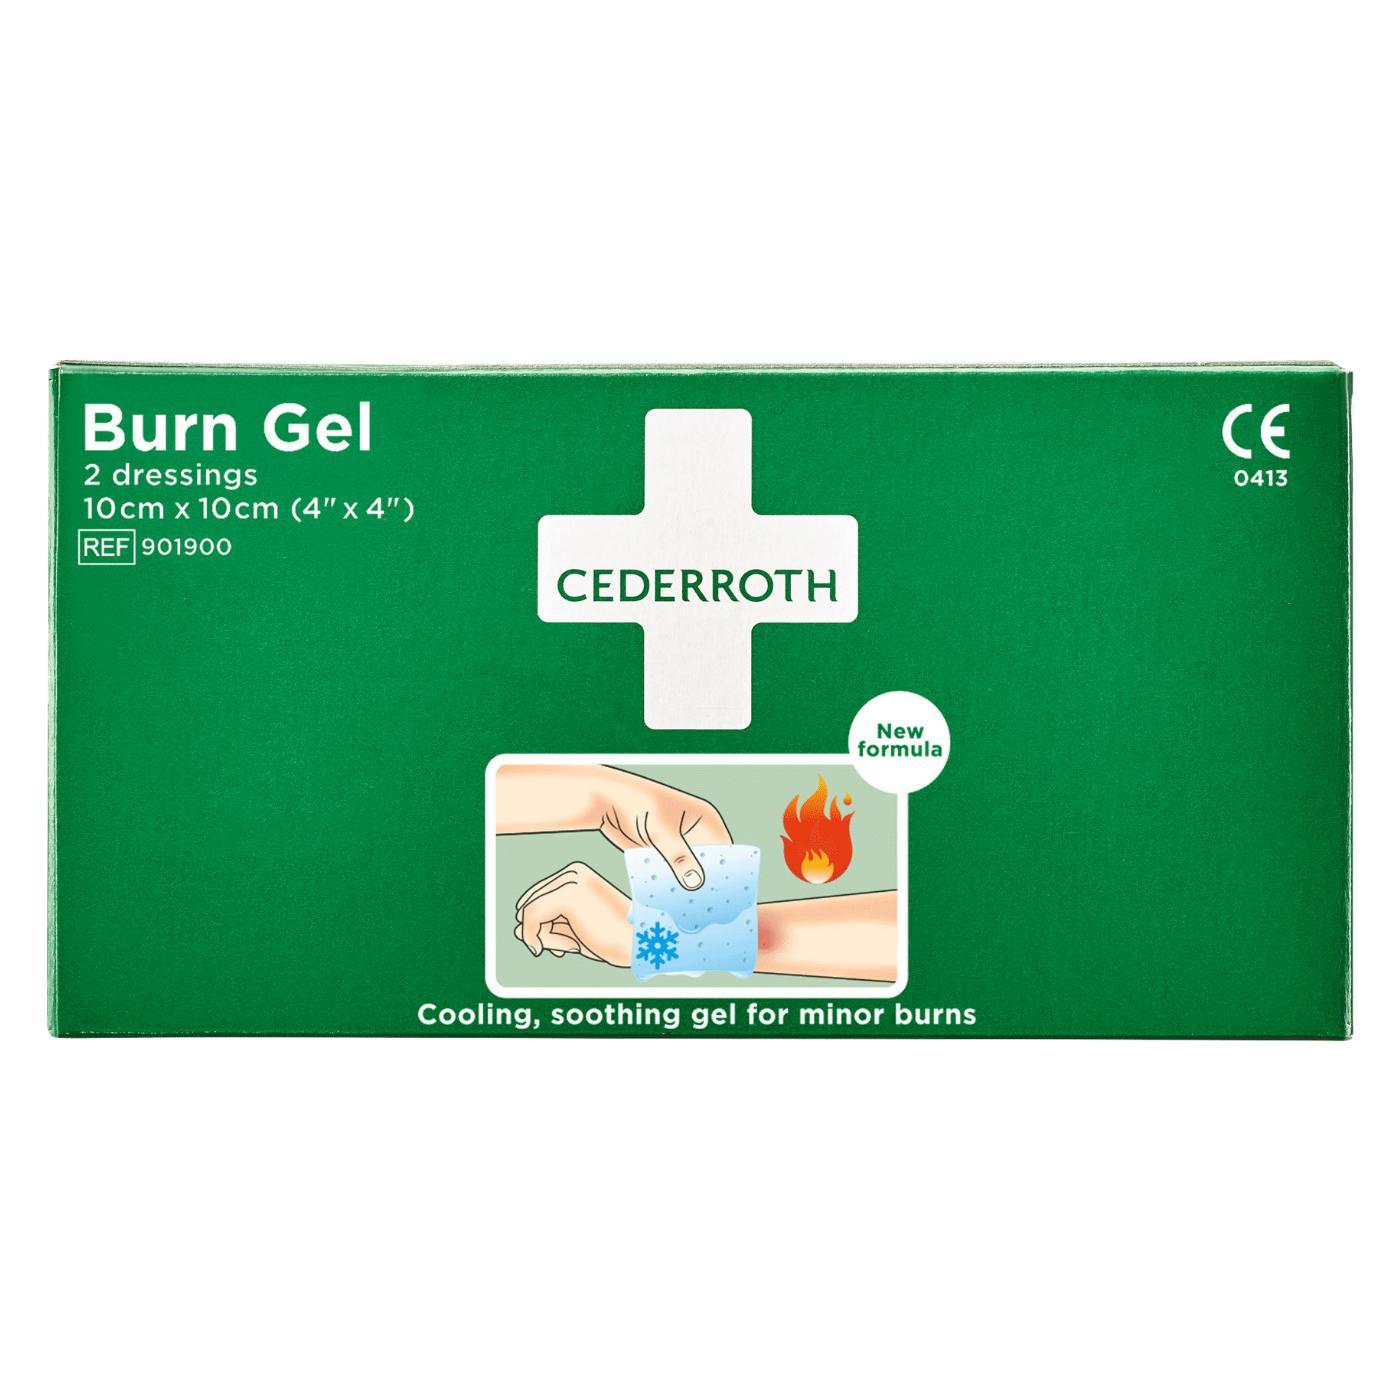 Żel na oparzenia Cederroth Burn Gel Dressing 901900, 2 kompresy żelowe